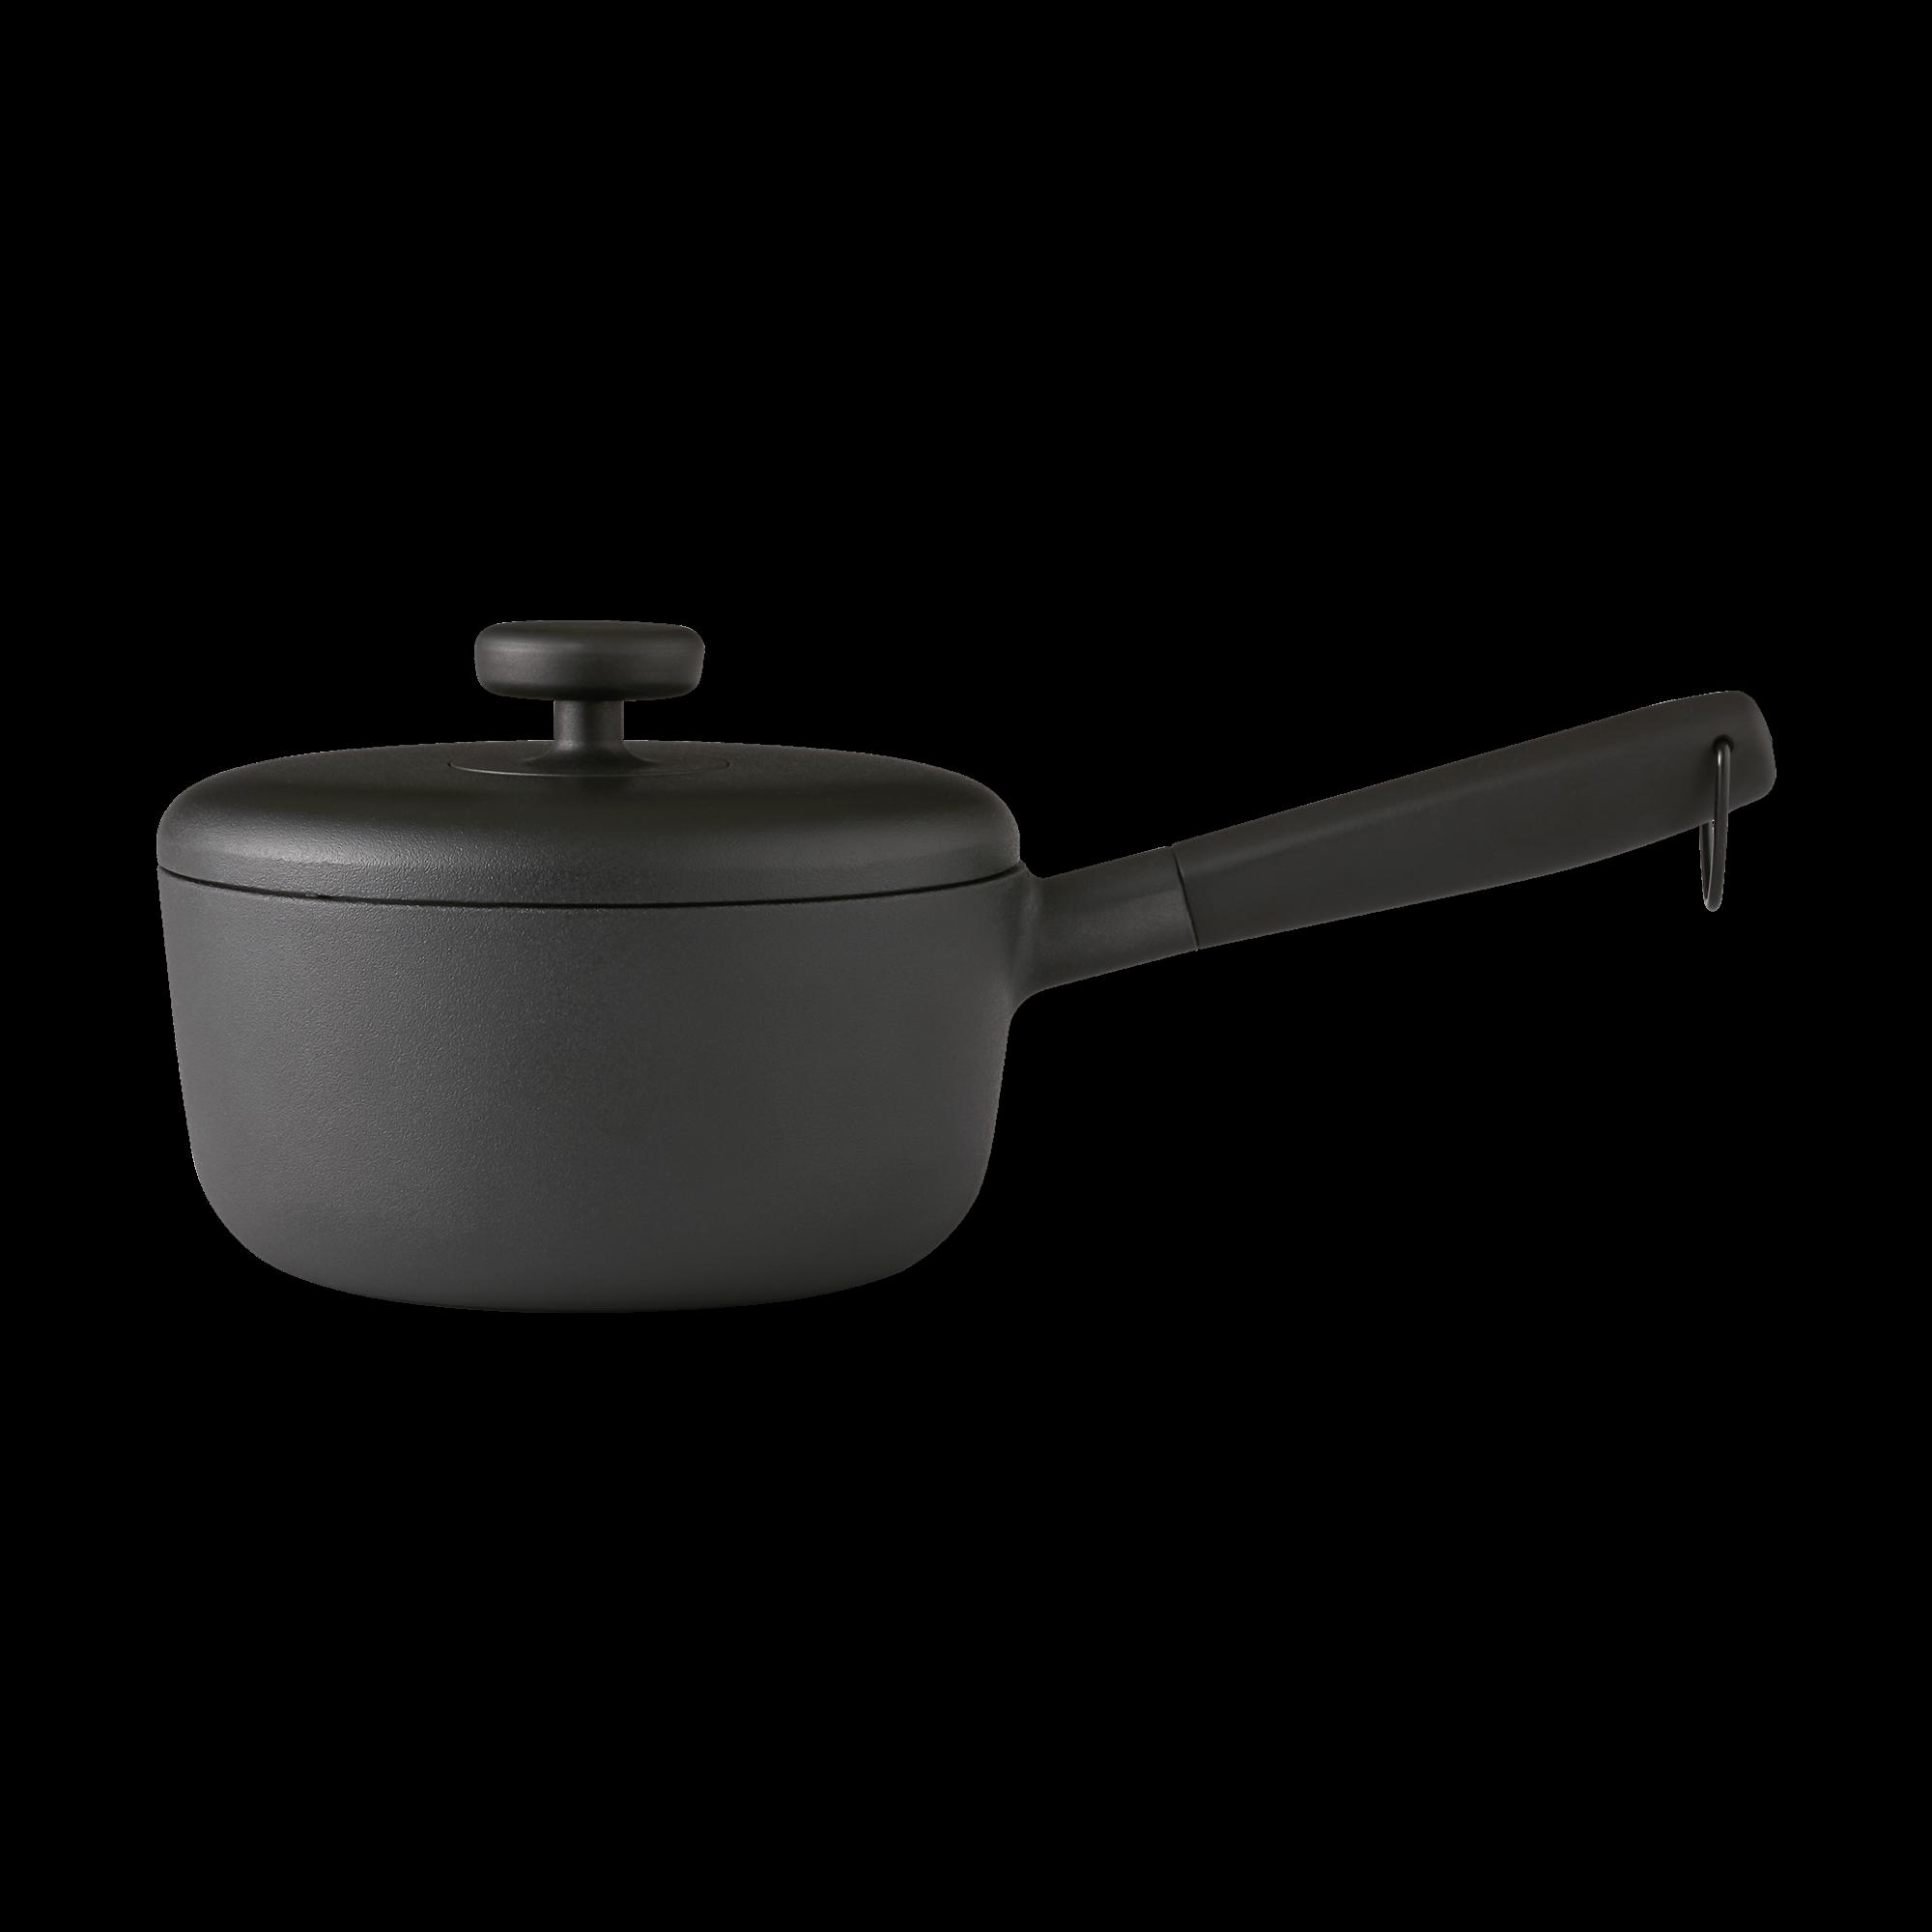 monolithic-sauce-pan-1